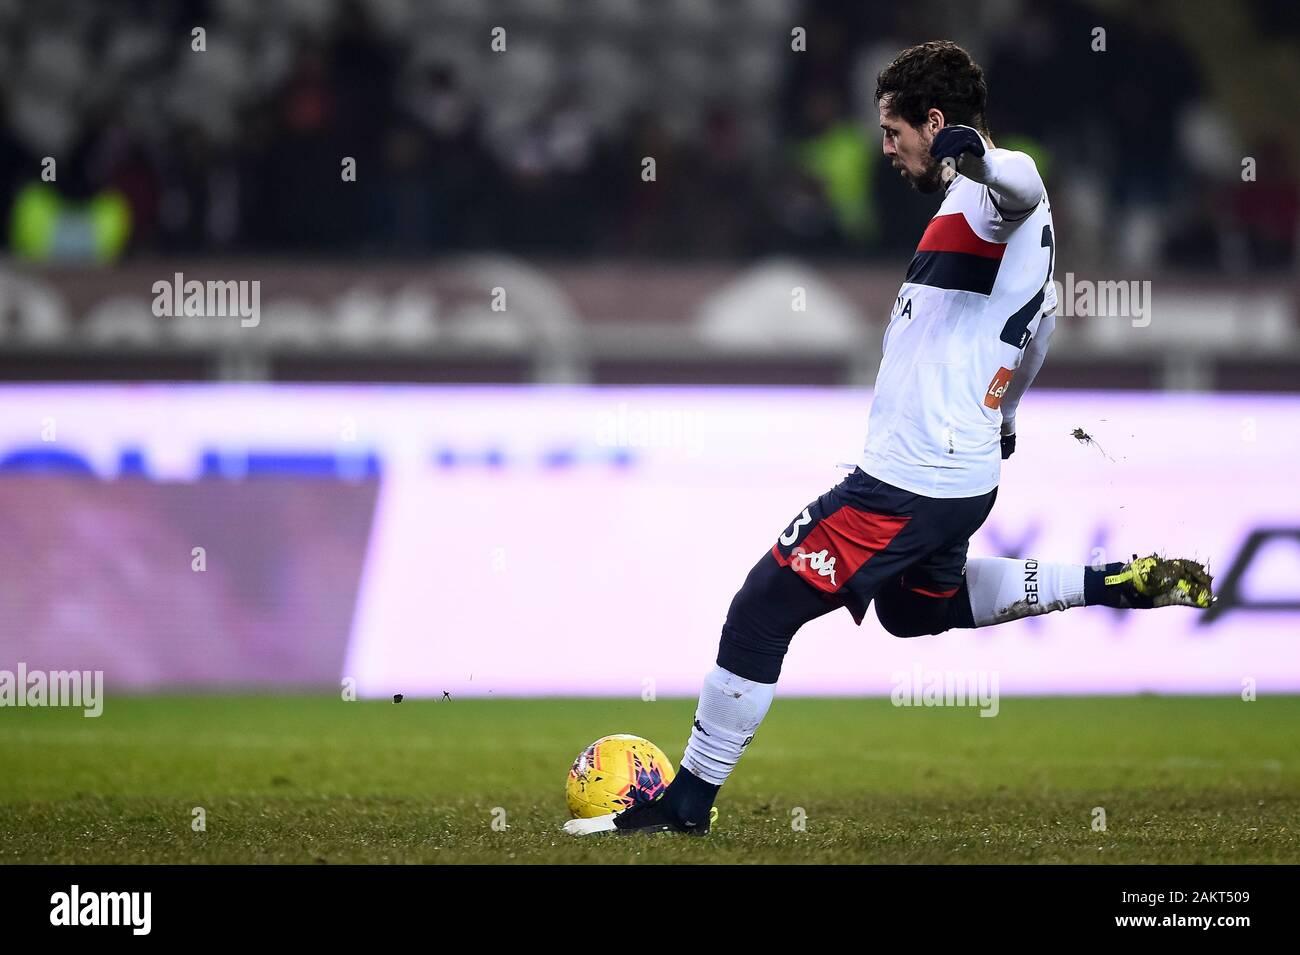 Turin Italy 09 January 2020 Mattia Destro Of Genoa Cfc Scores A Penalty Kick During The